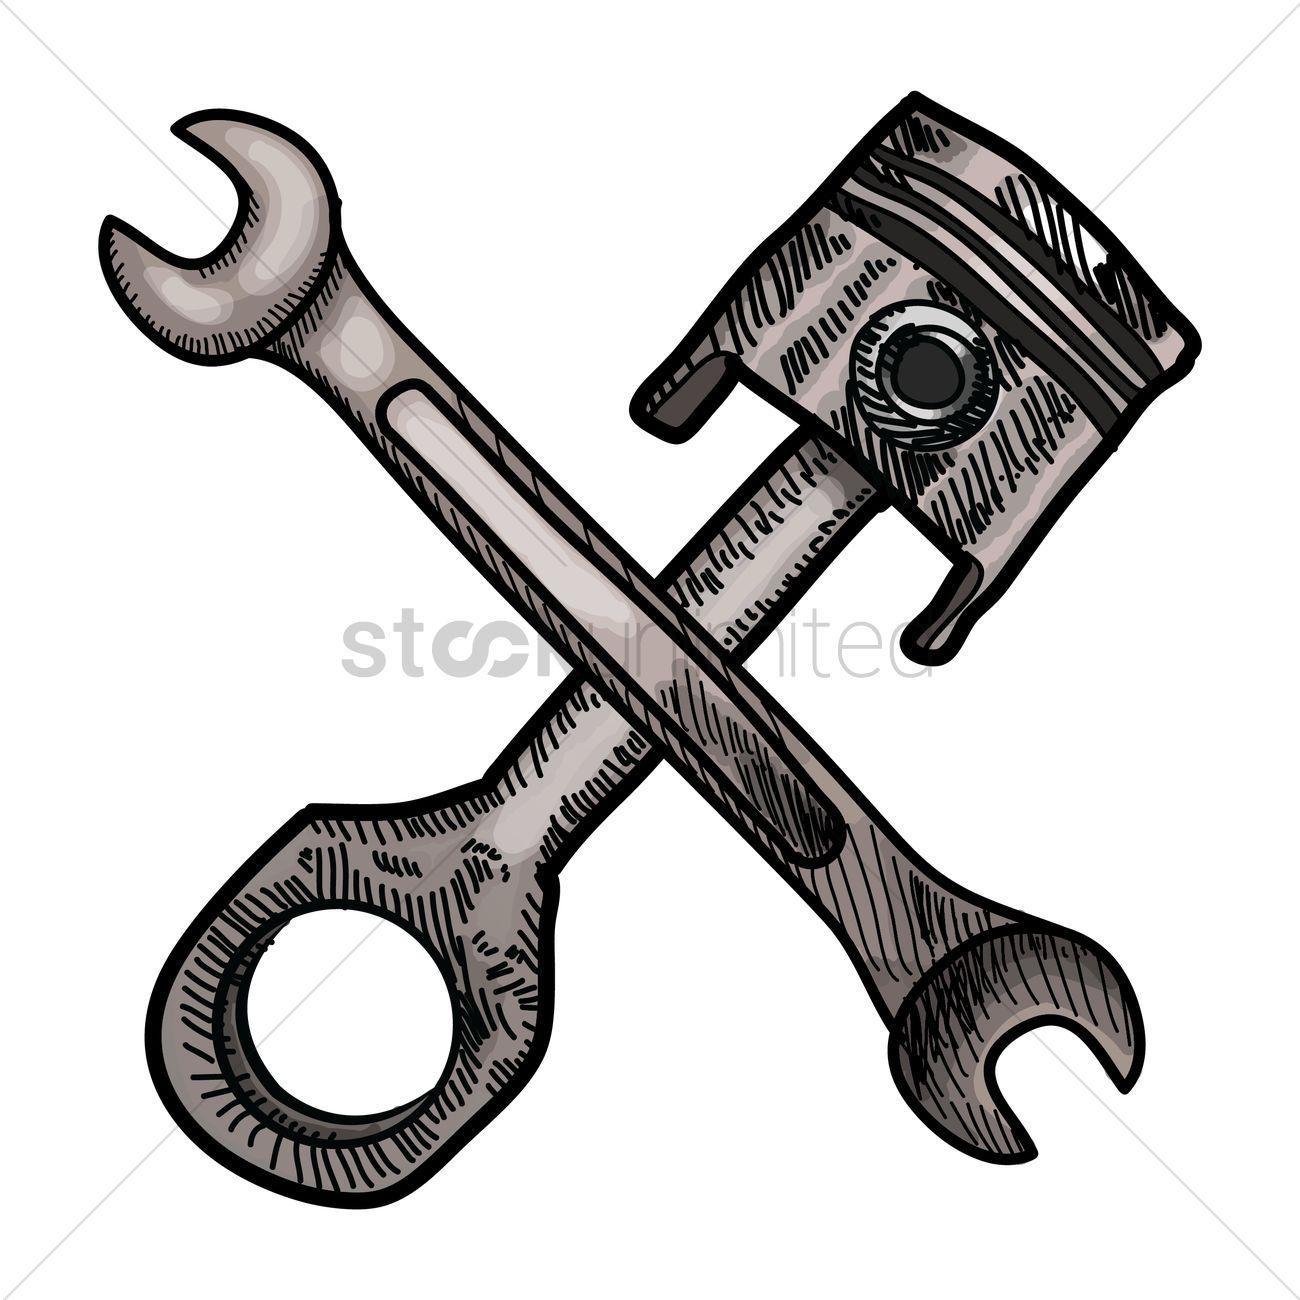 Piston and Wrench Logo - LogoDix